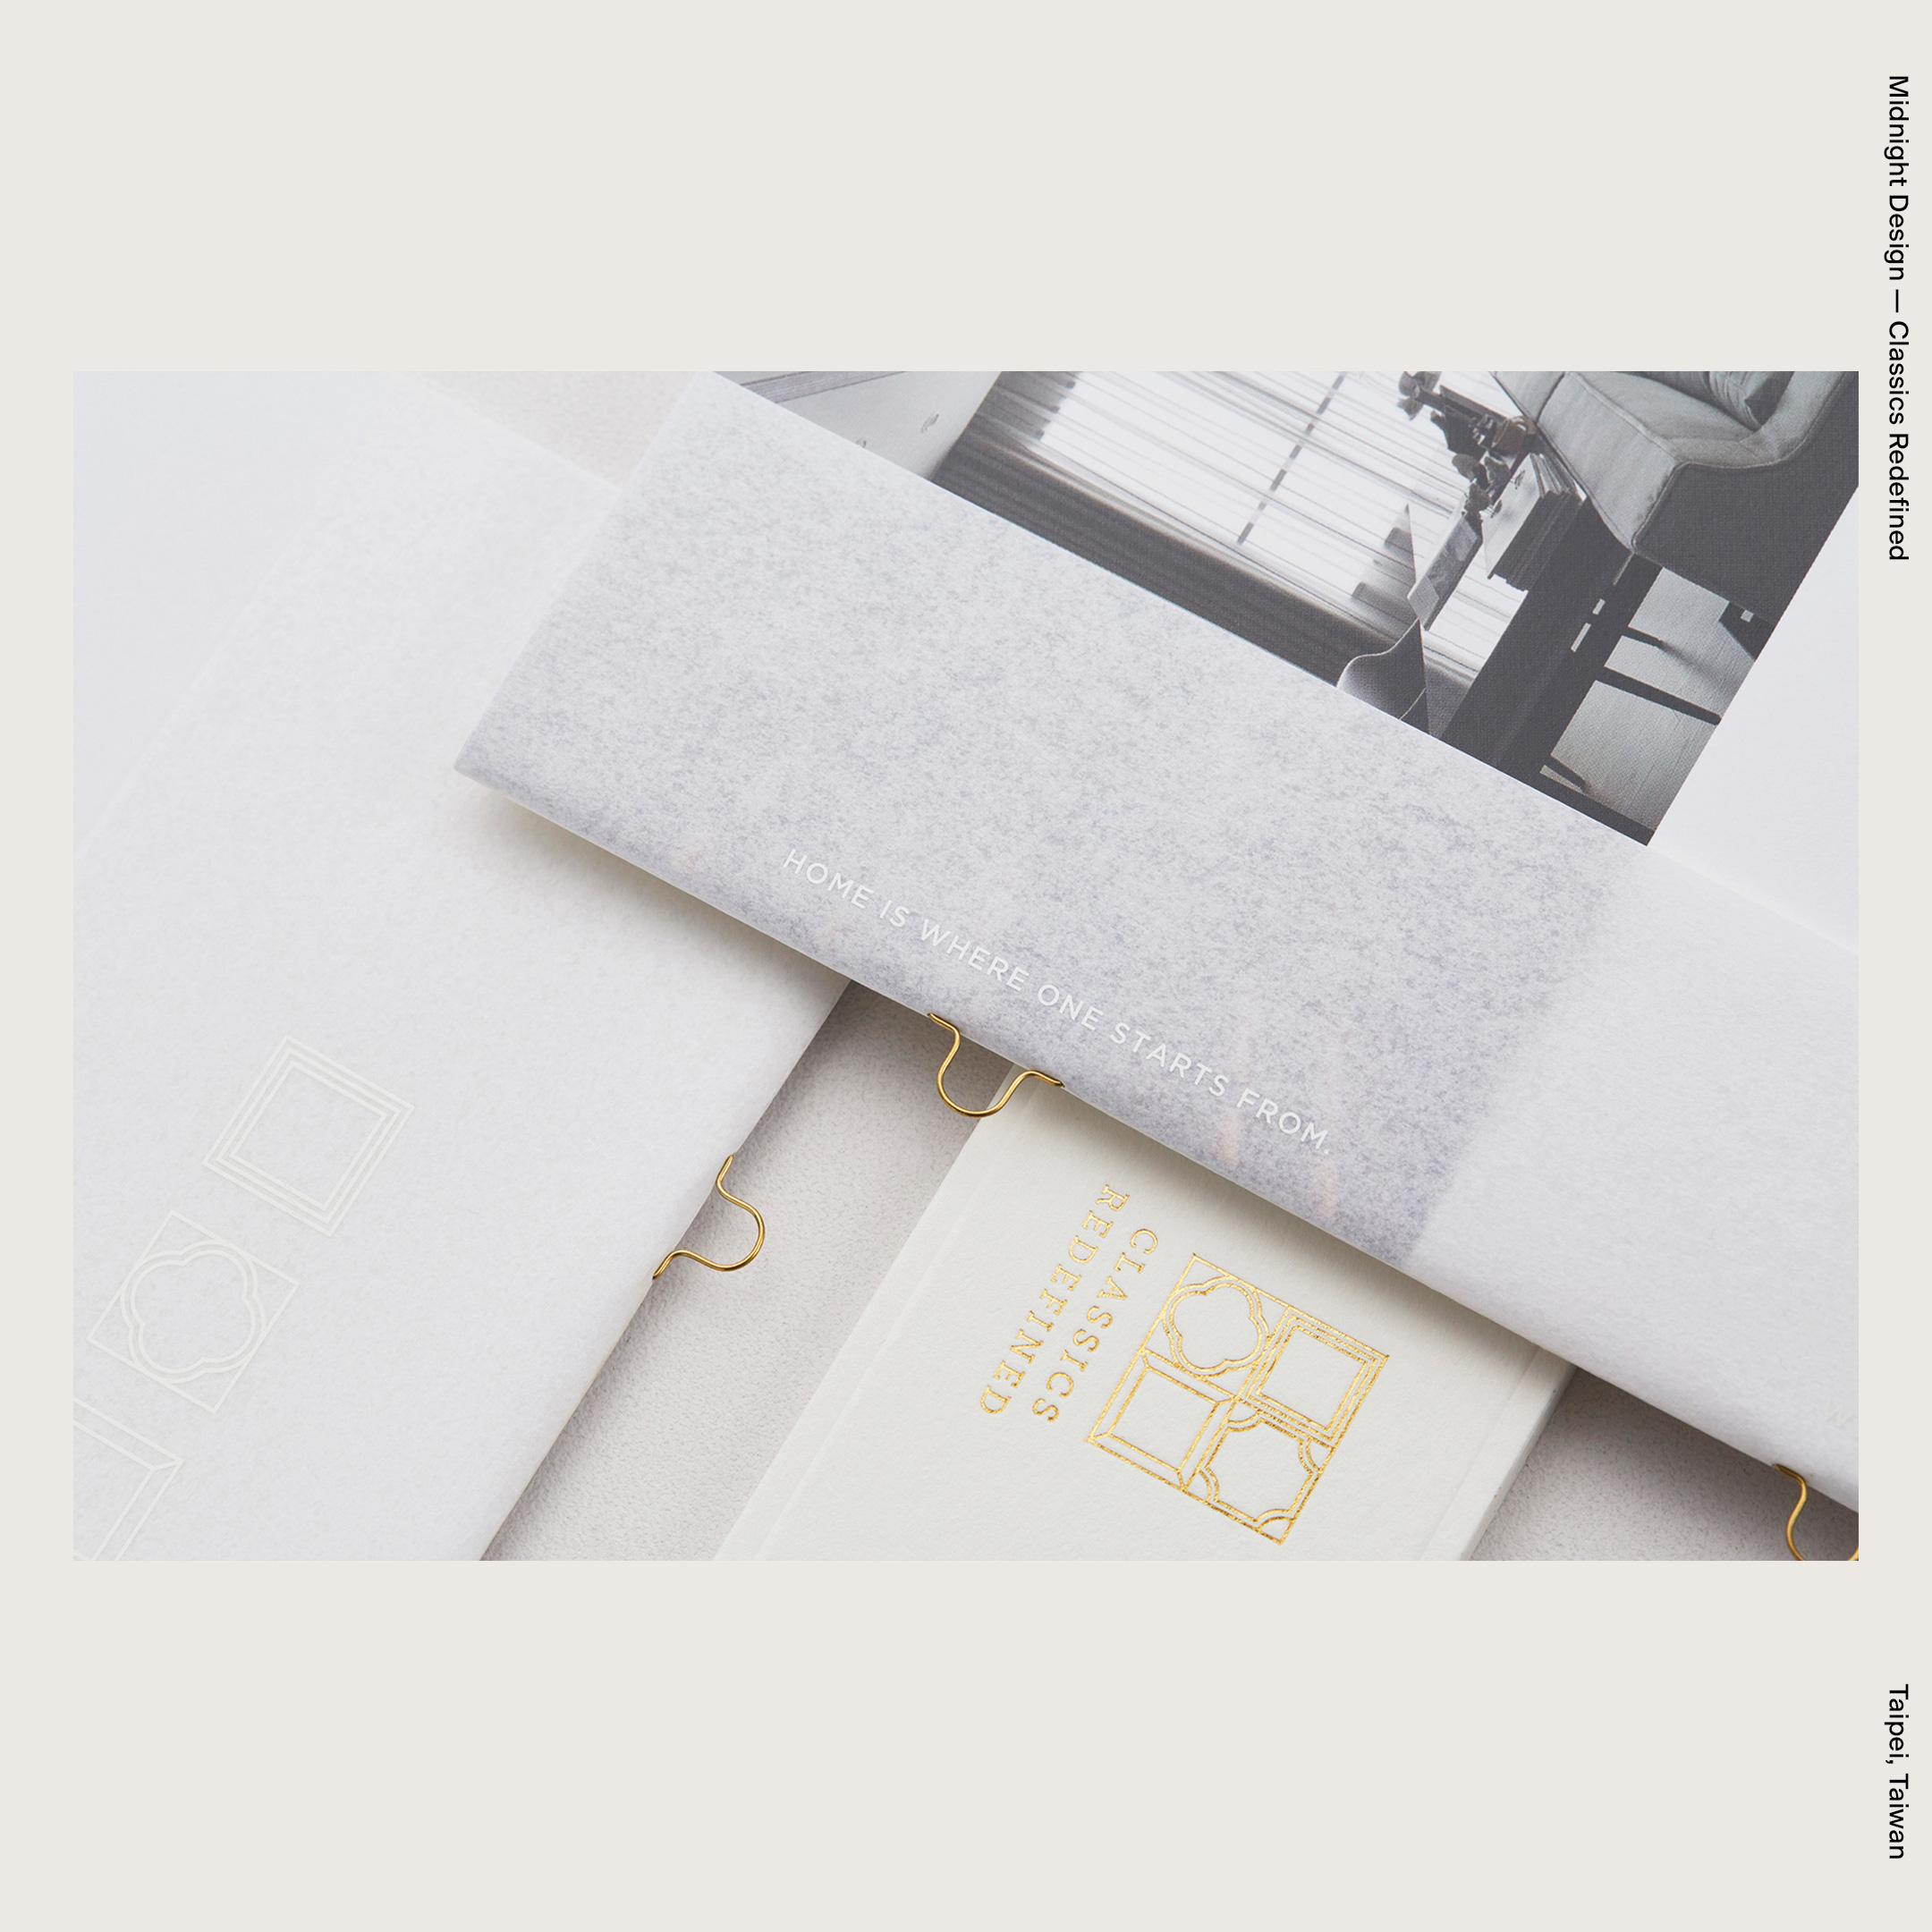 Midnight Design — Classics Redefined